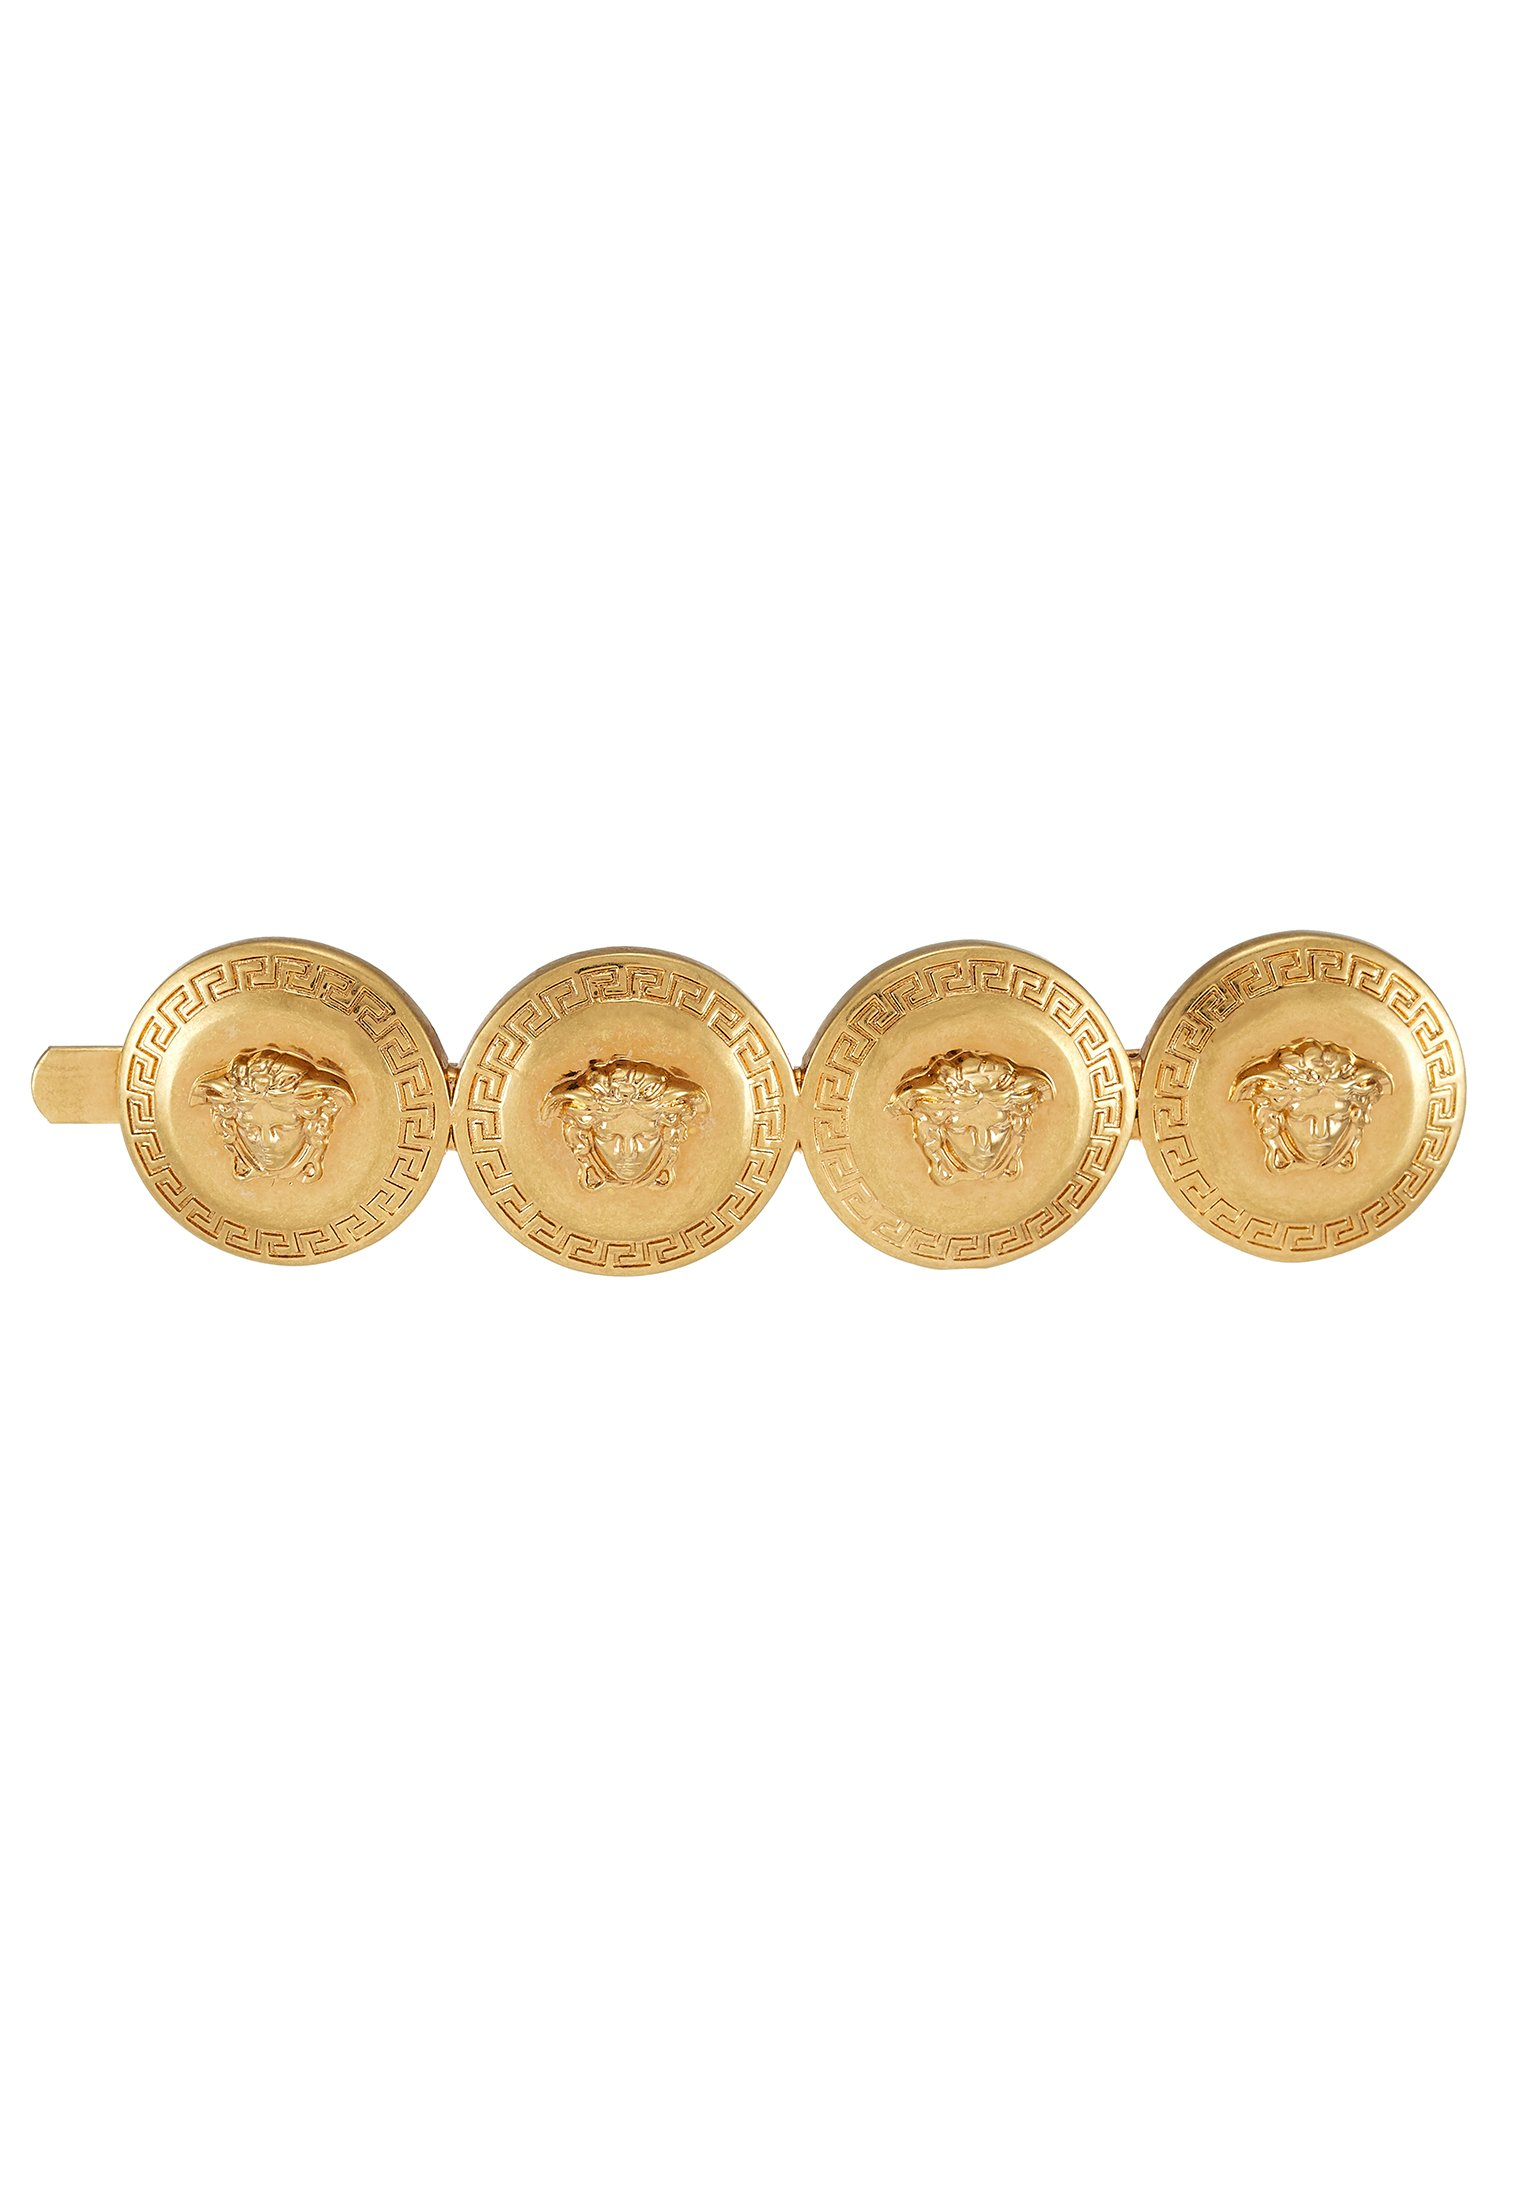 Versace HAIR ACCESSORIES - Accessoires cheveux - gold-coloured